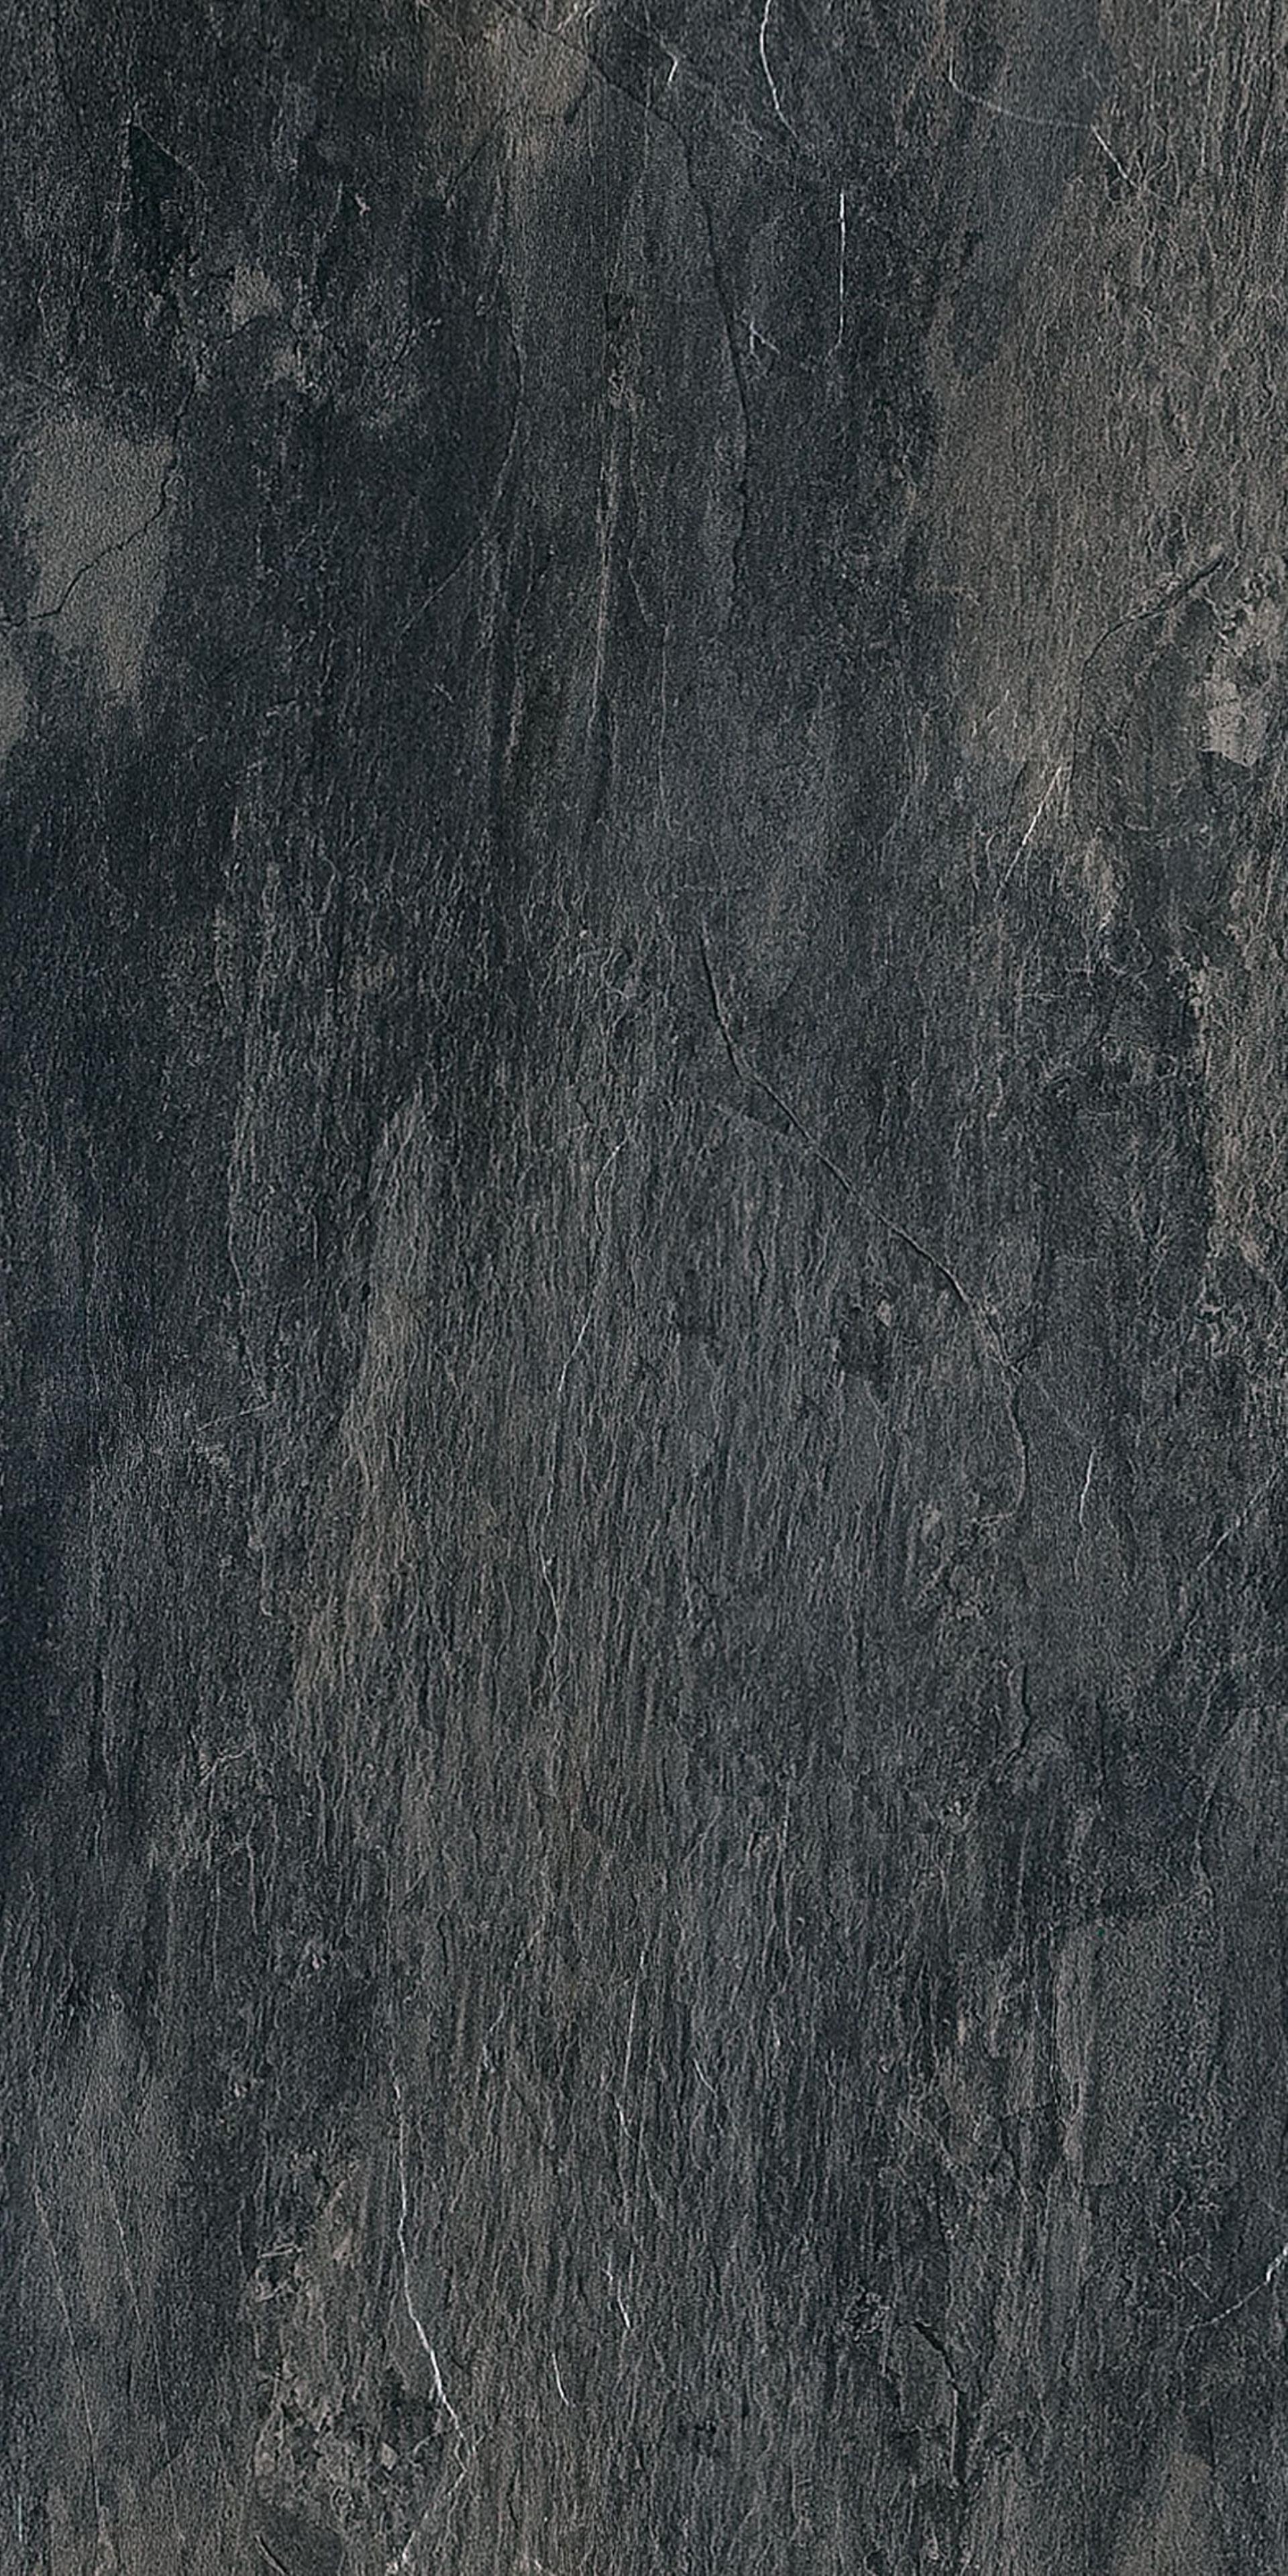 Texture 4k Wallpaper 187 Wall Texture Types Textured Walls Material Textures